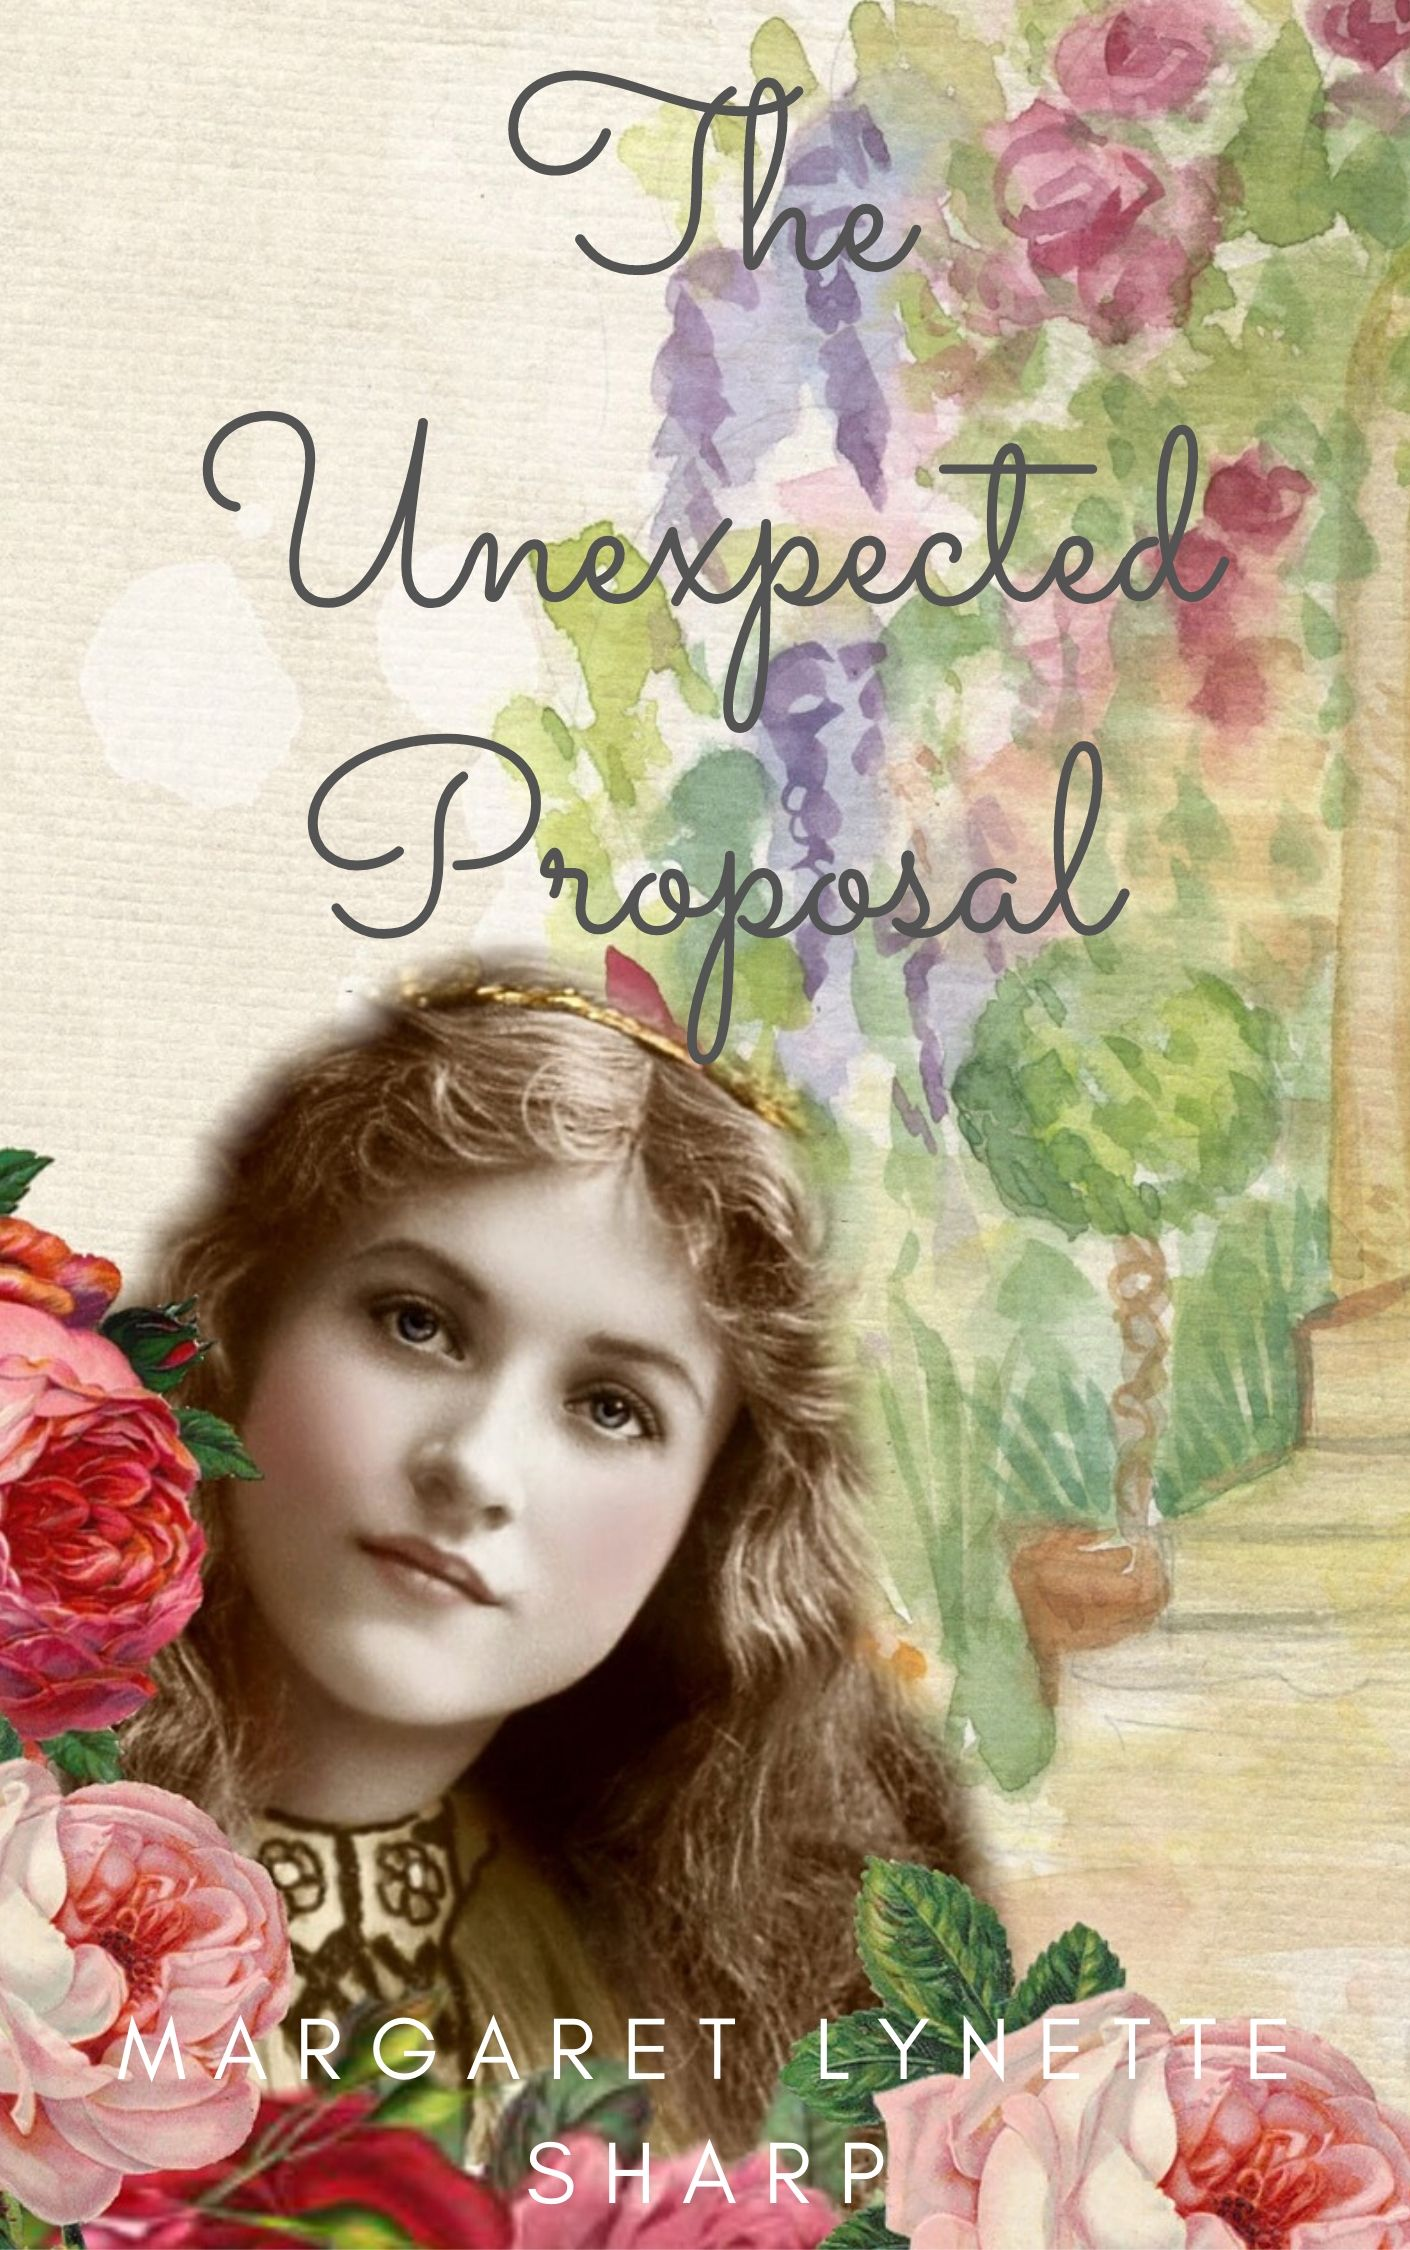 [PDF] [EPUB] The Unexpected Proposal: A 'Pride and Prejudice' Variation Vignette Download by Margaret Lynette Sharp